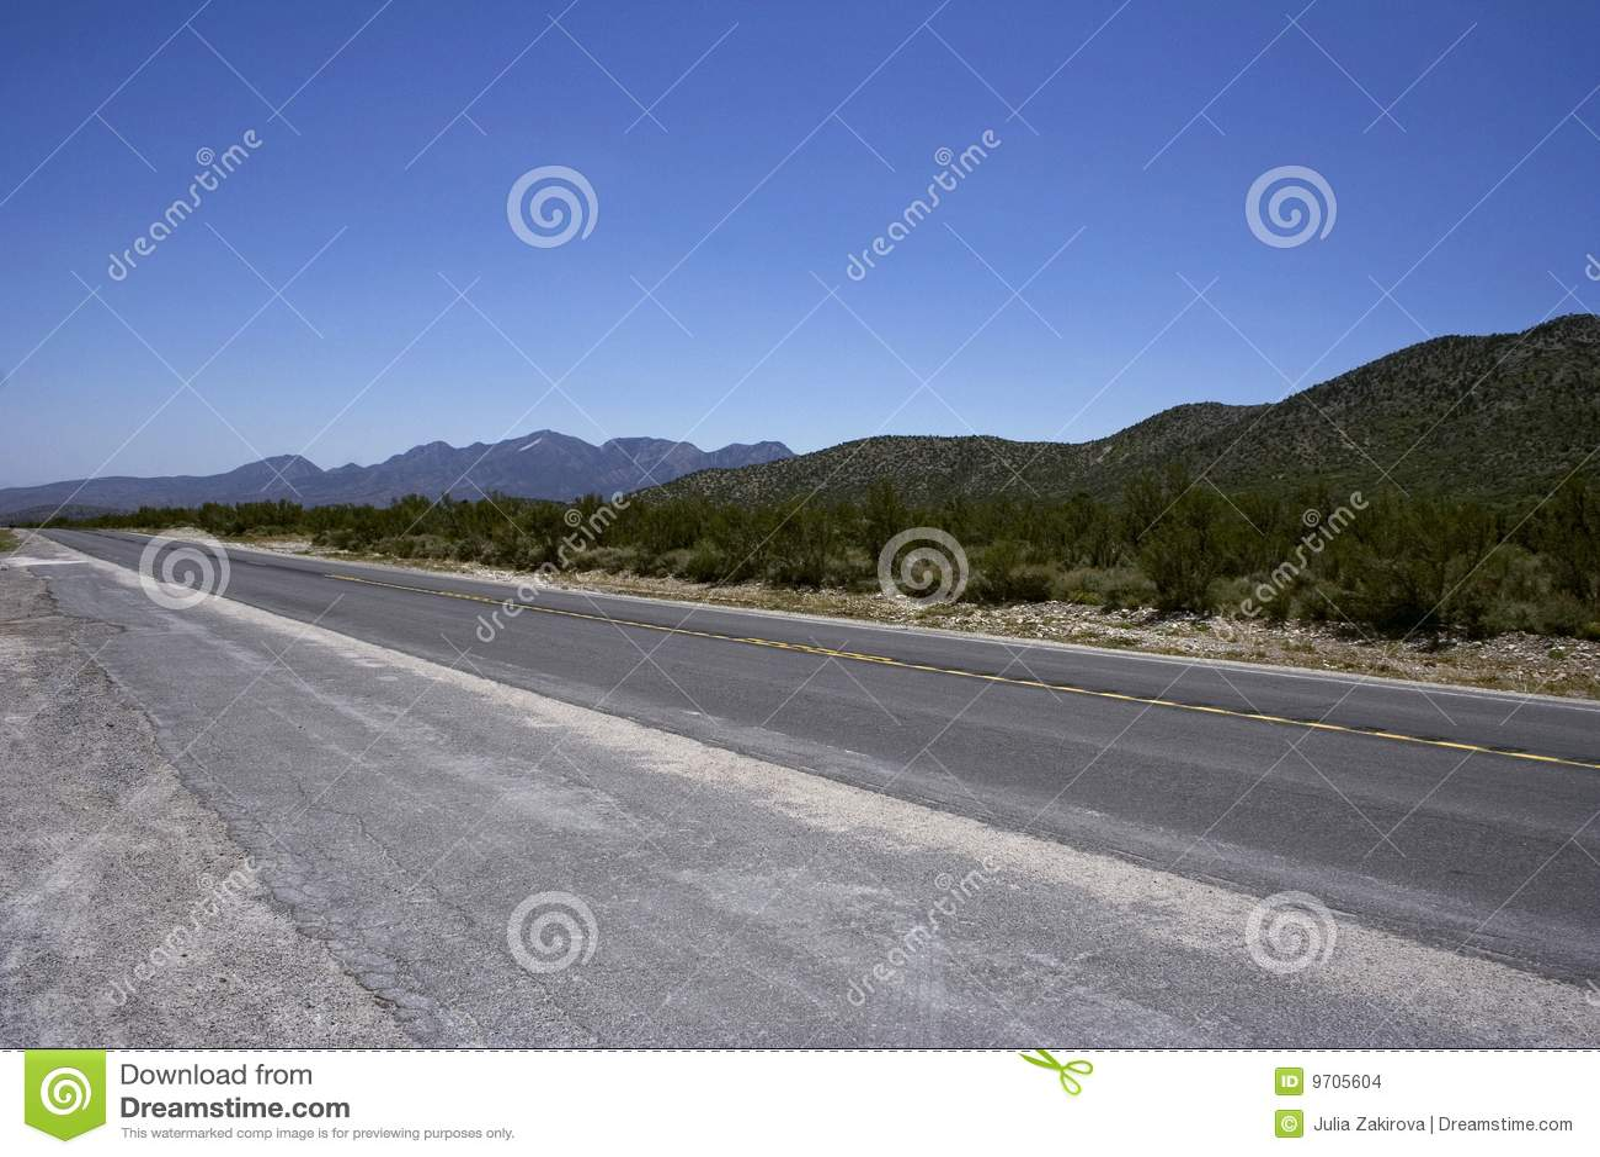 Empty freeway with the yellow stripe